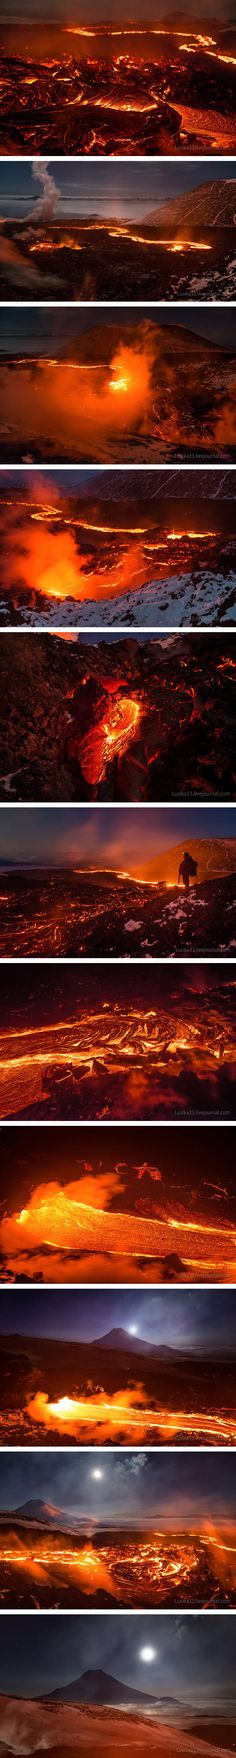 Active Volcano in Kamchatka, Russia.